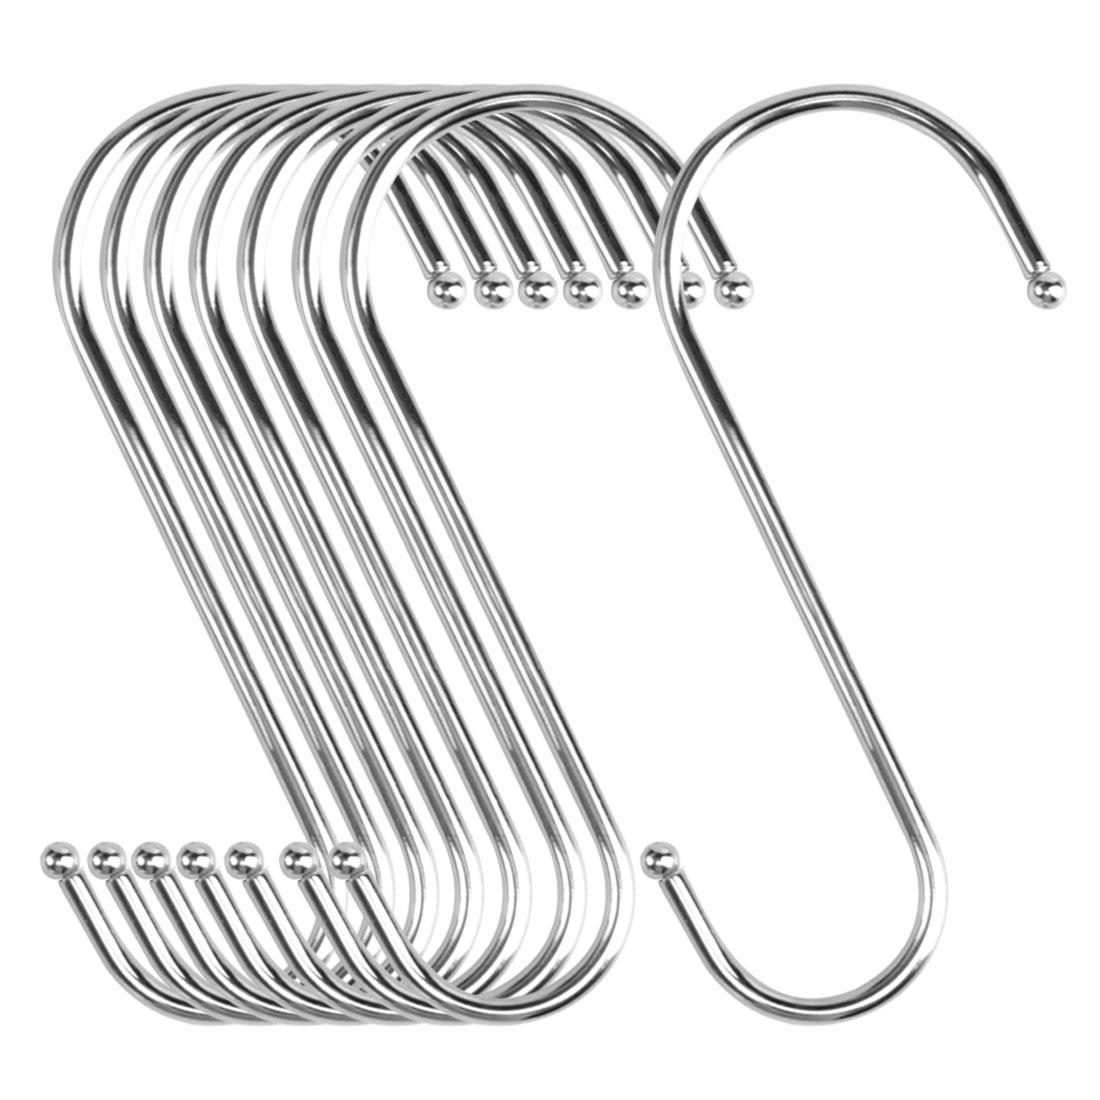 8pcs S Shaped Hook Stainless Steel Kitchenware Hat Utensil Pot Holder